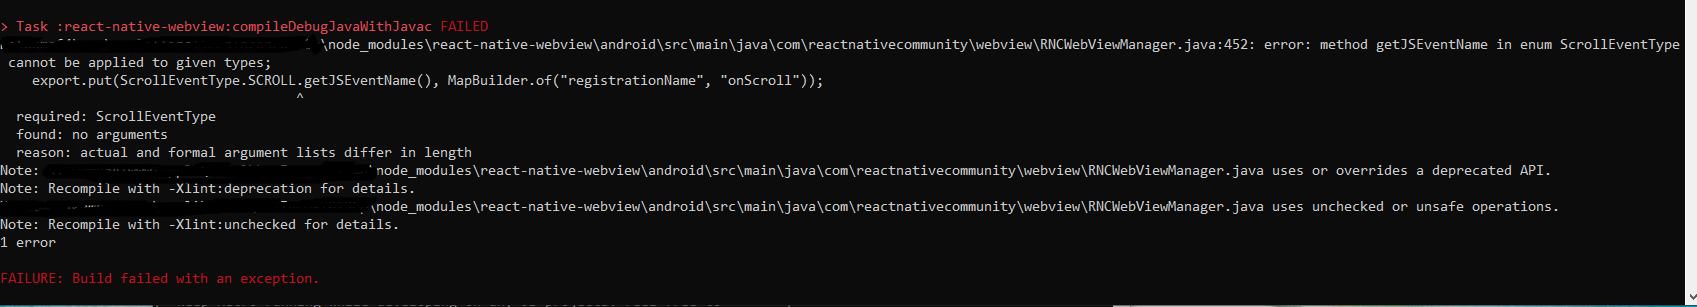 error: method getJSEventName in enum ScrollEventType cannot